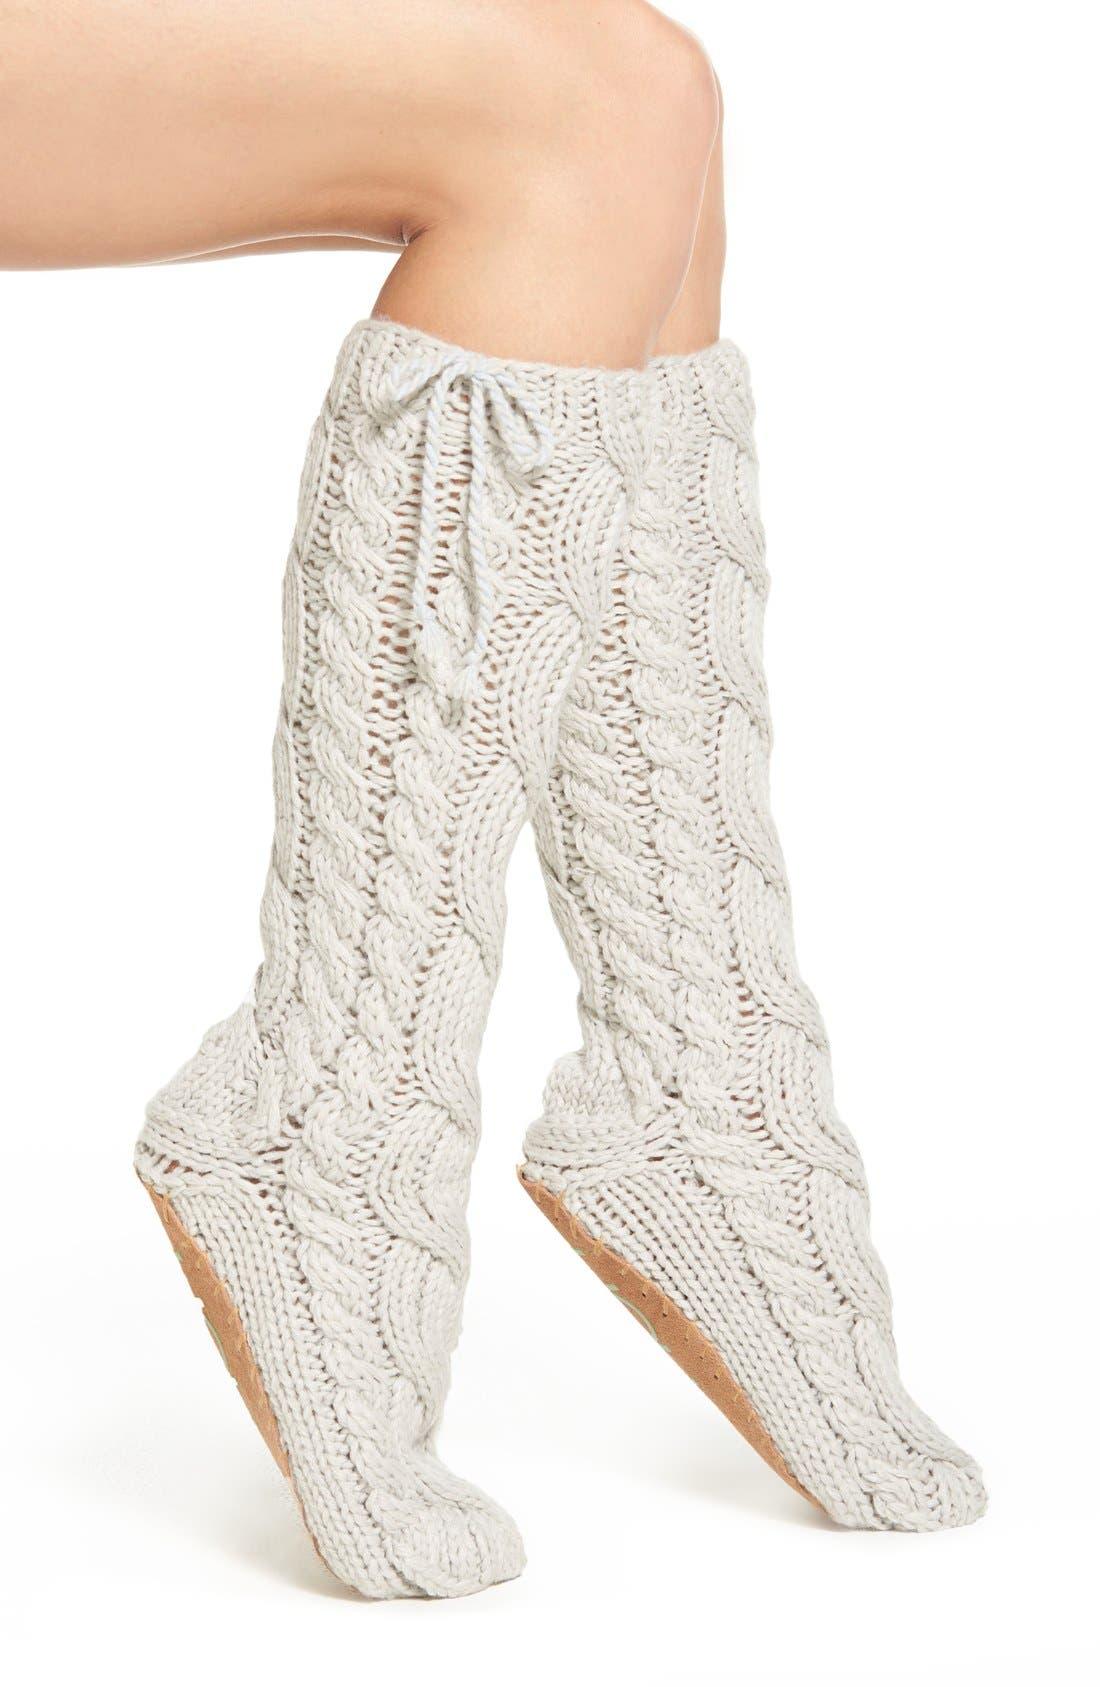 LEMON, 'Arctic' Cable Knit Knee High Slippers, Main thumbnail 1, color, 020